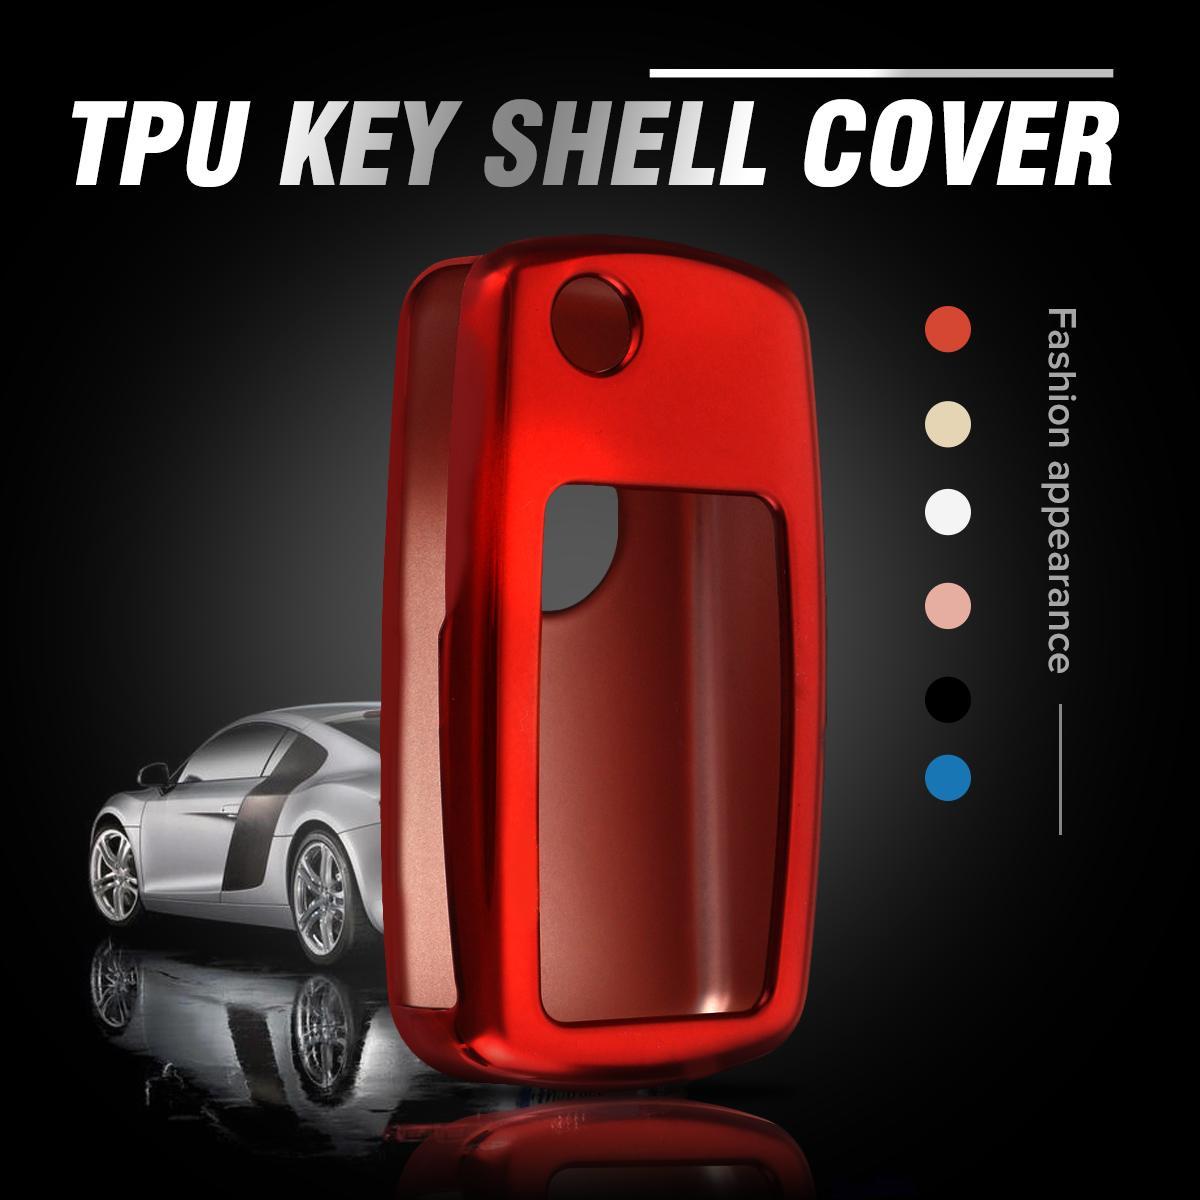 TPU Car Key Case For Volkswagen For VW Passat Golf Jetta Bora Polo Sagitar Tiguan CC Transporter Cover Protector 2009 - 2013